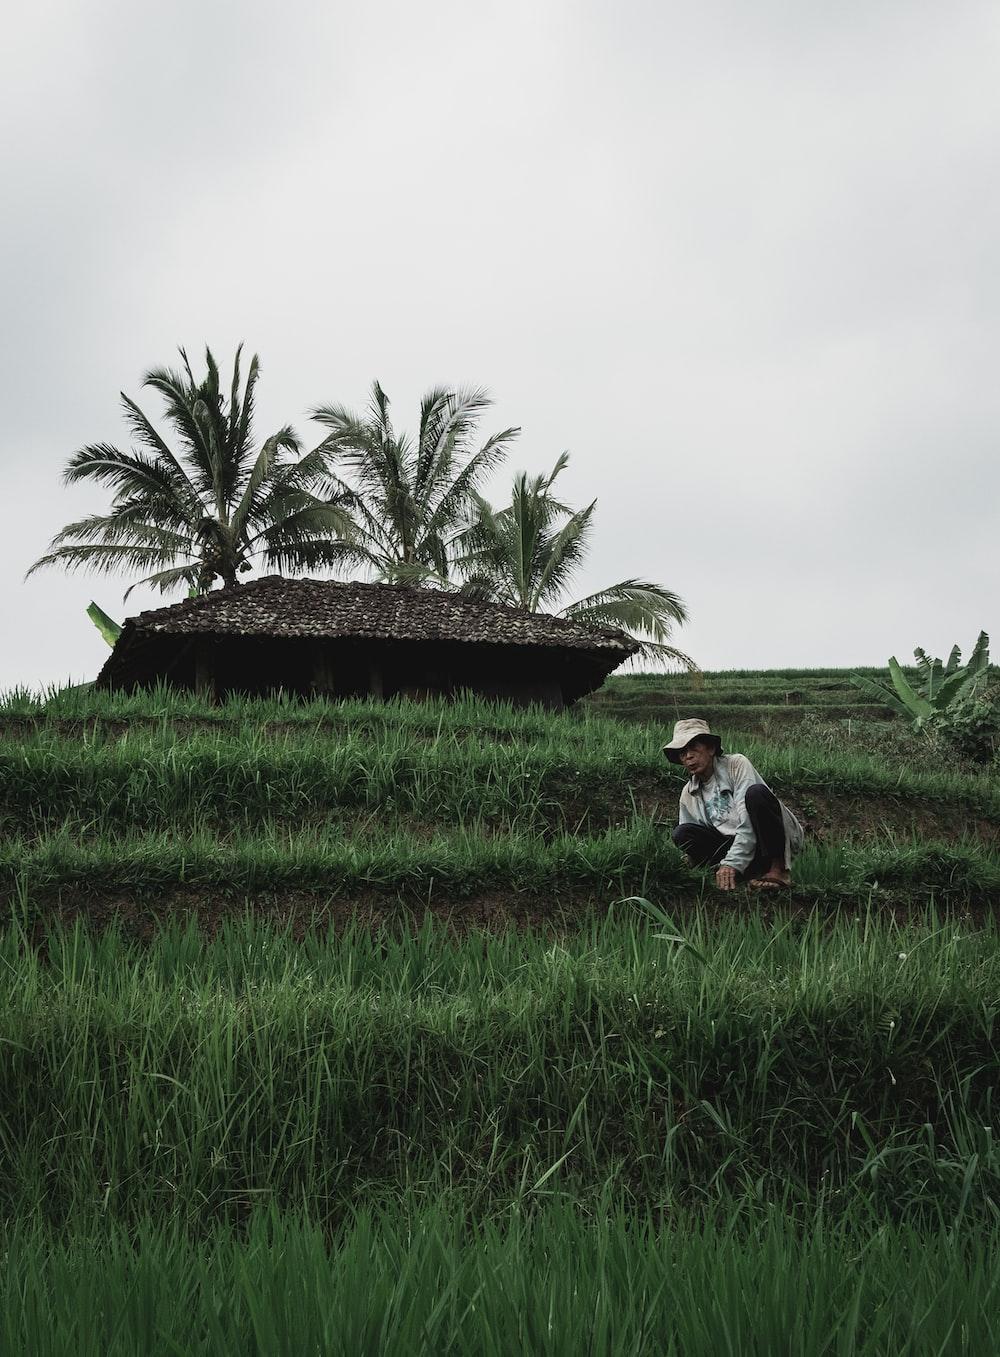 man in white shirt sitting on green grass field during daytime